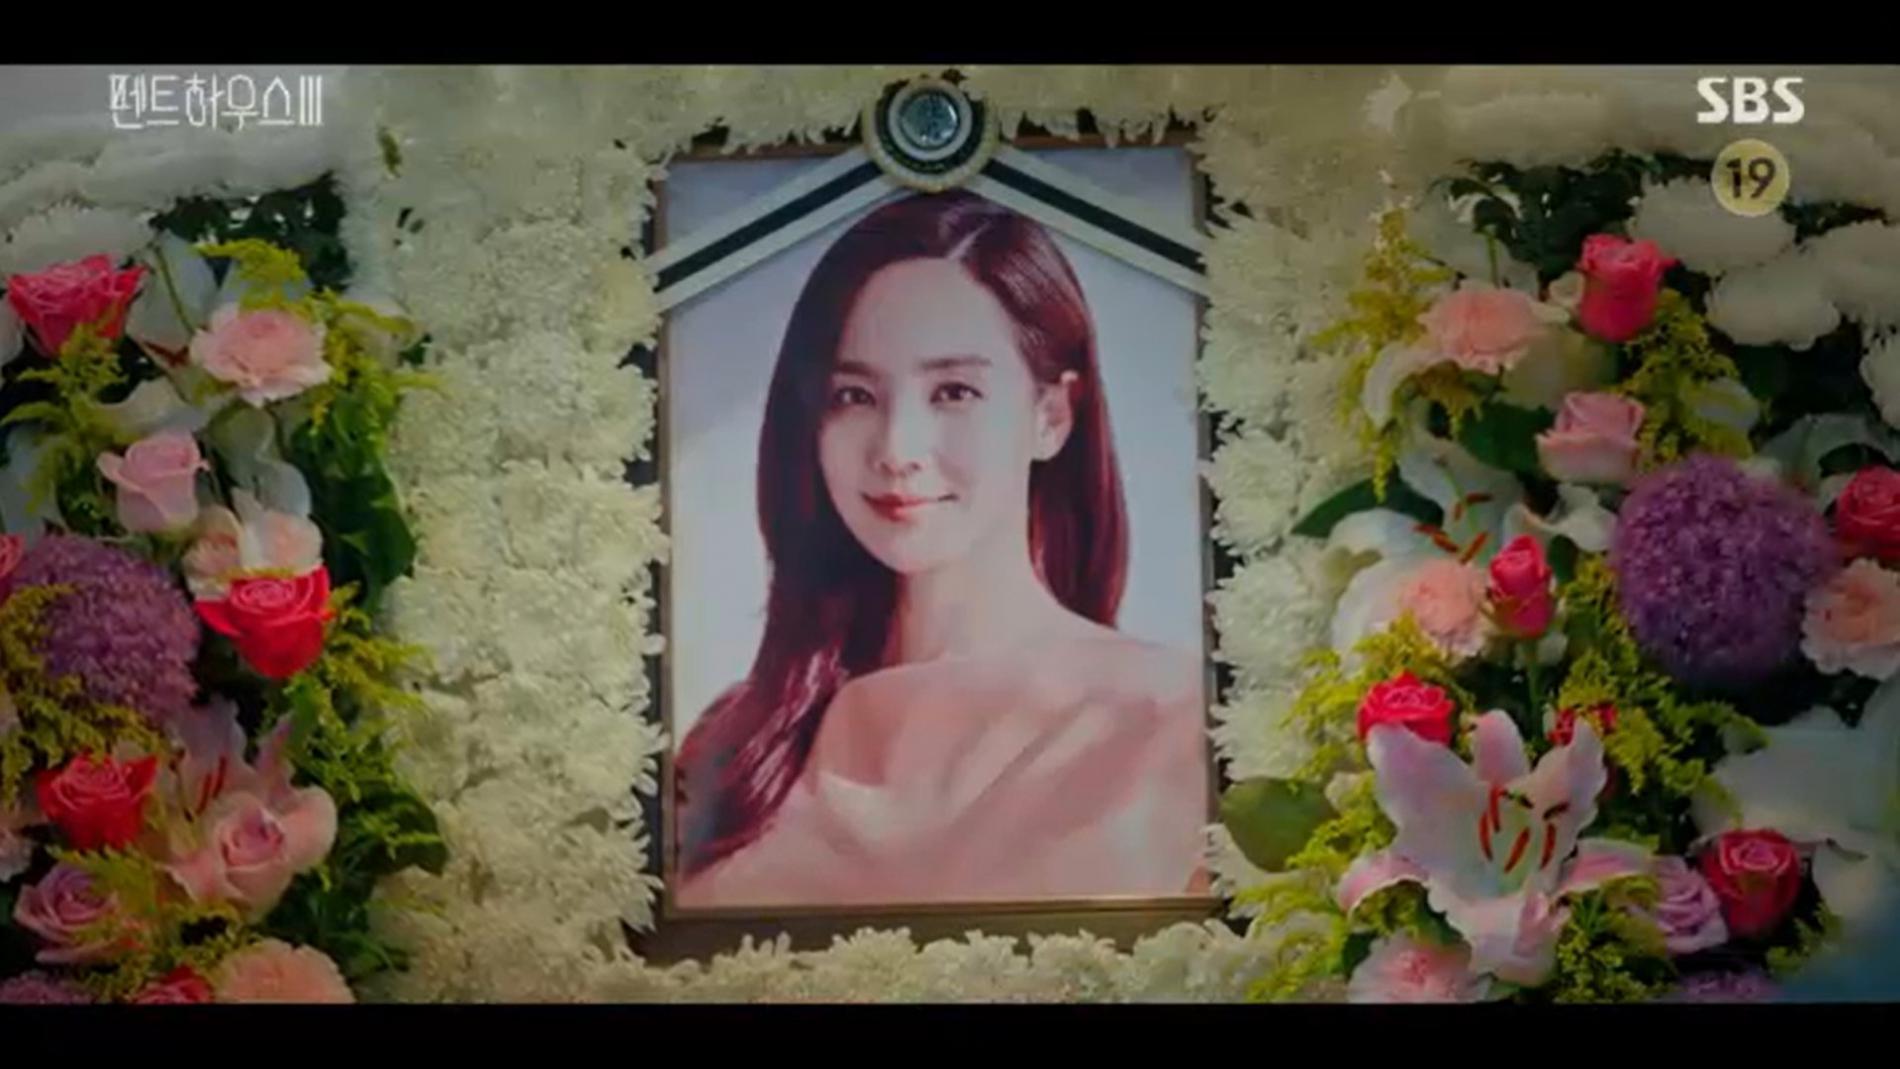 Drama Korea The Penthouse season 3 Episode 5 Full Sub Indo, Surga yang Hilang